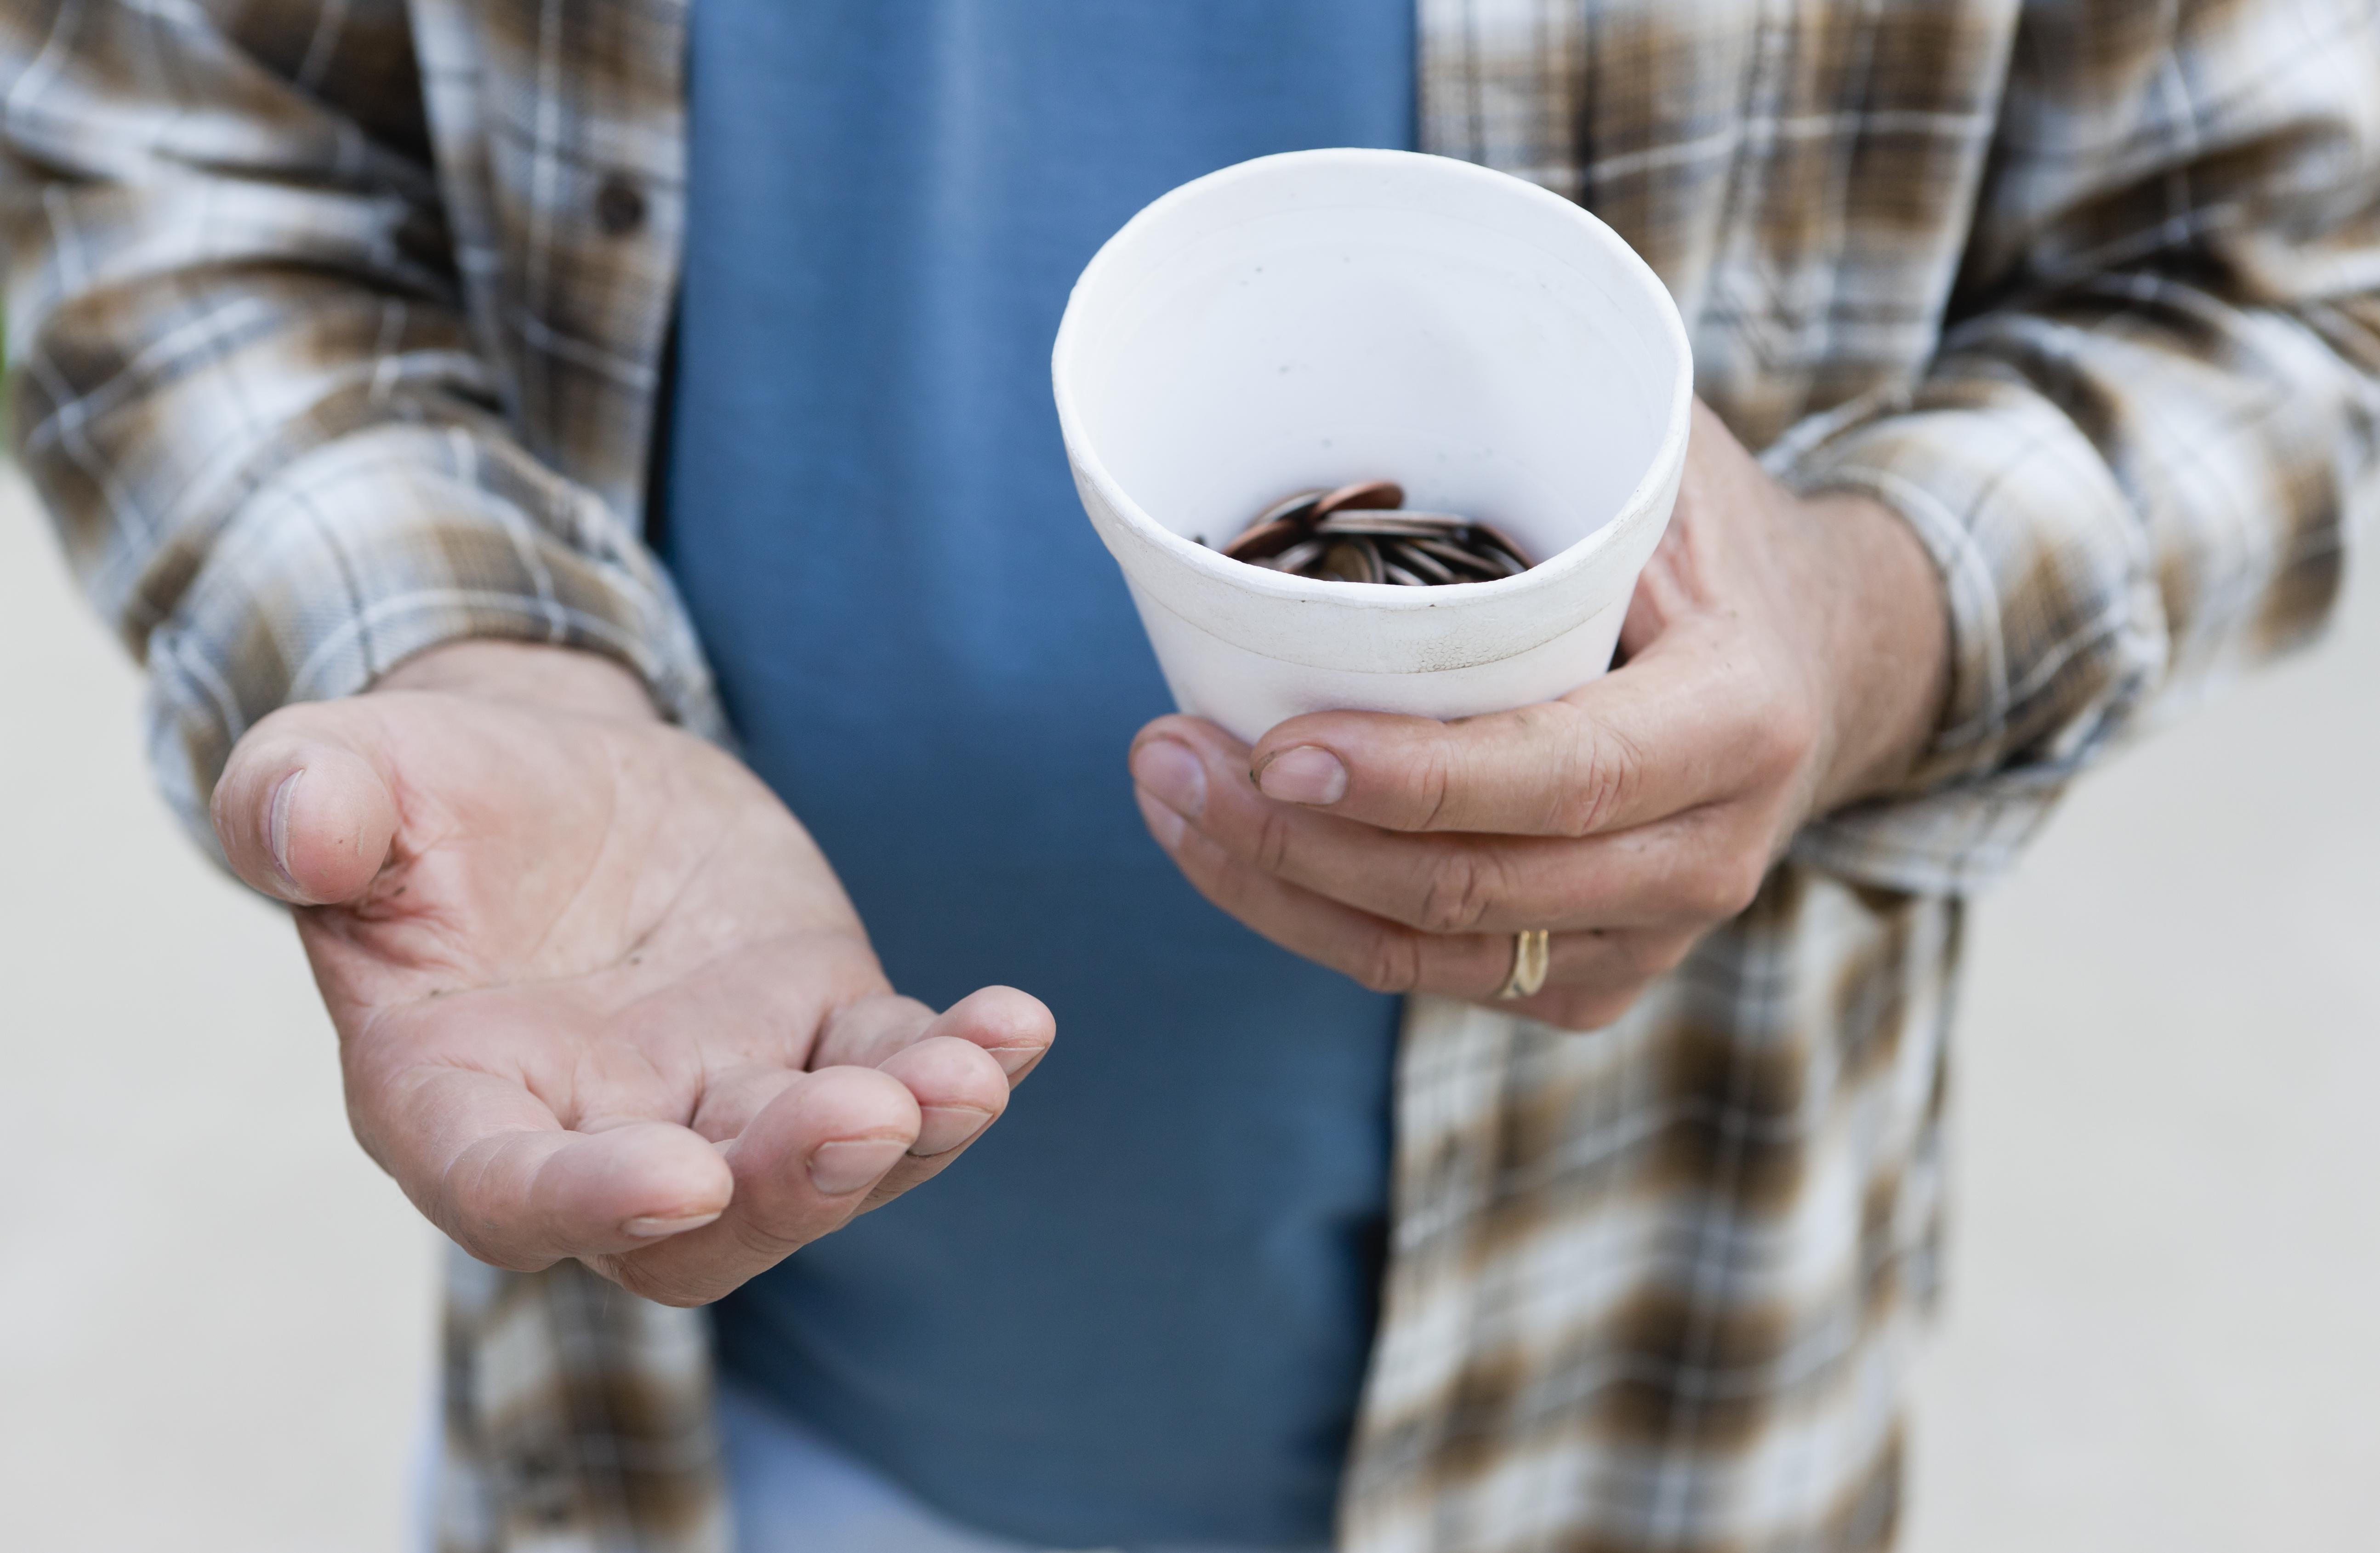 USA, Illinois, Metamora, Close-up of man begging for money